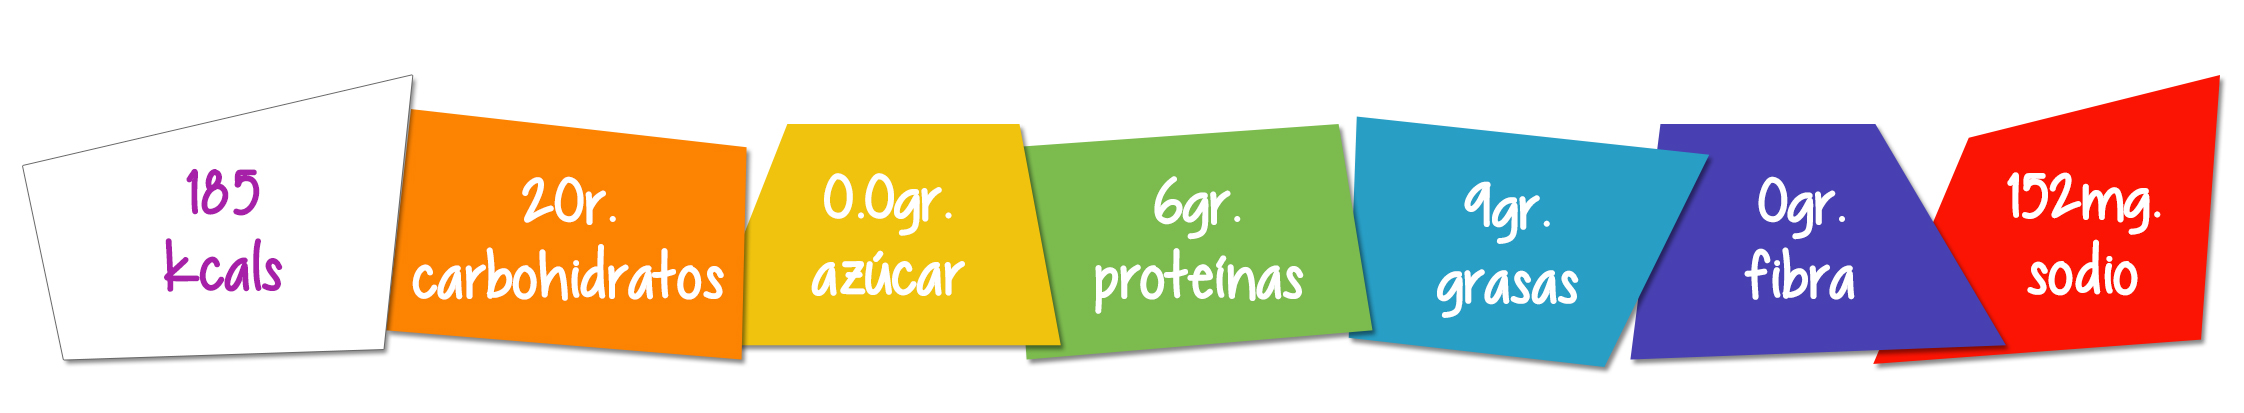 tabla_nutricional_empanadas